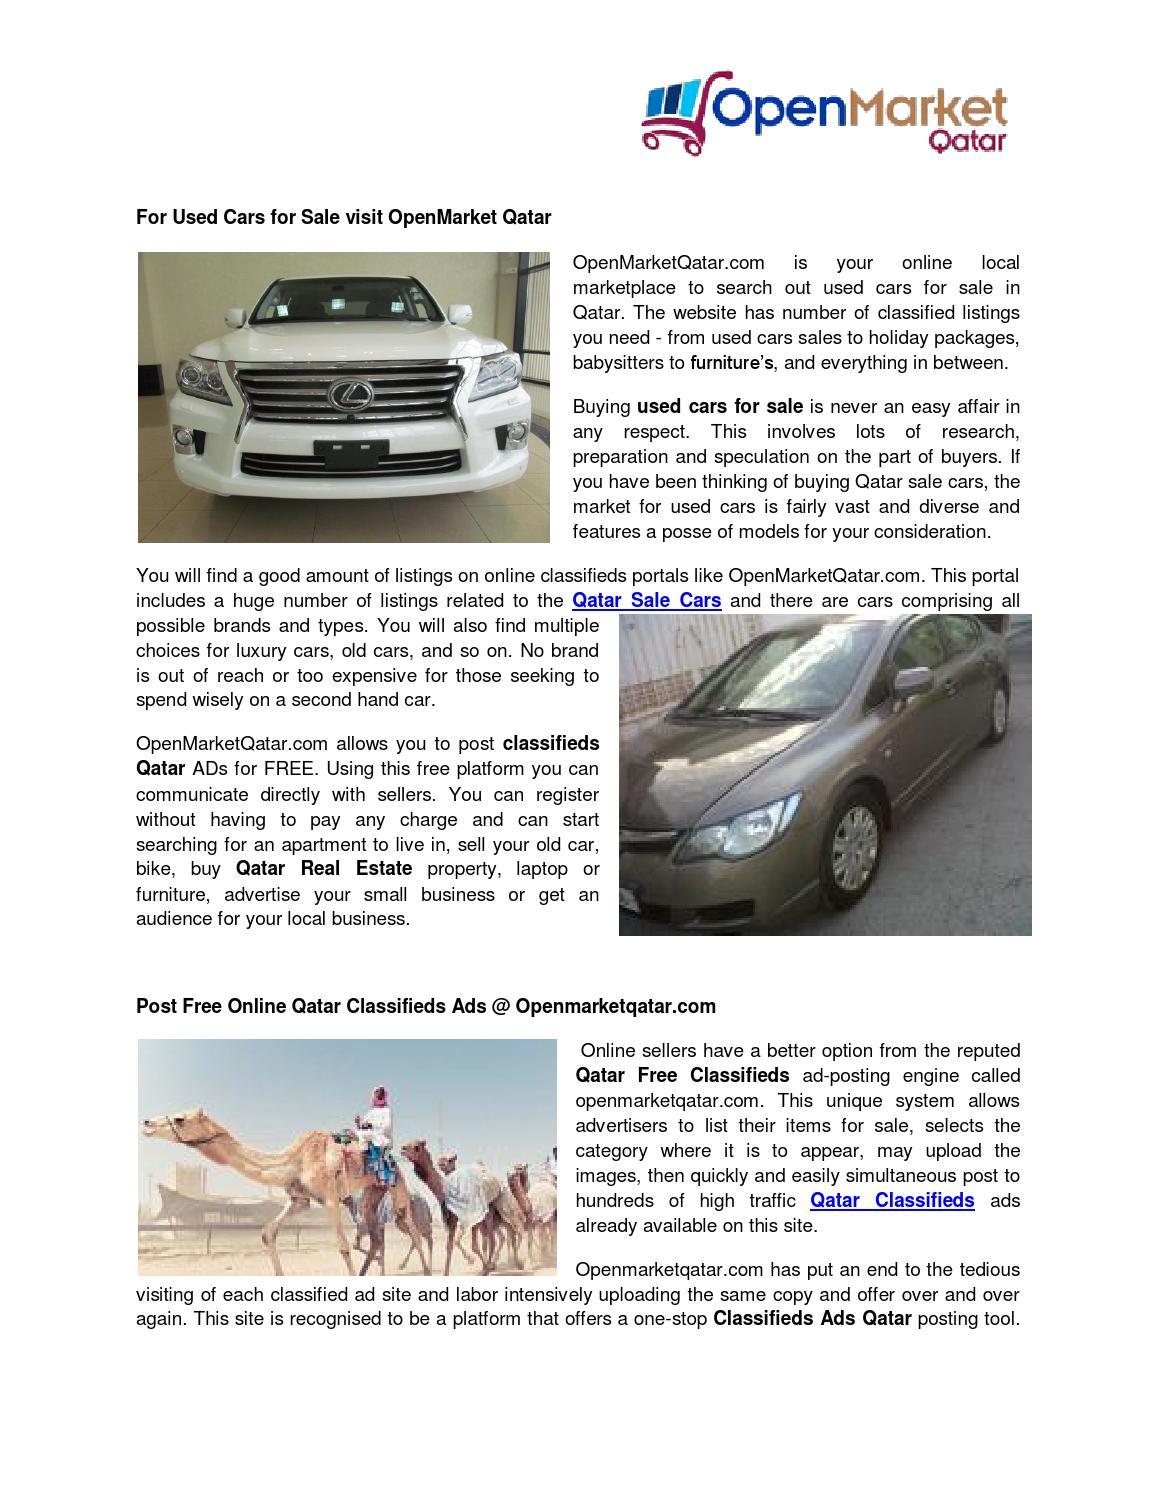 Used Cars For Sale In Qatar by Openmarket Qatar - issuu